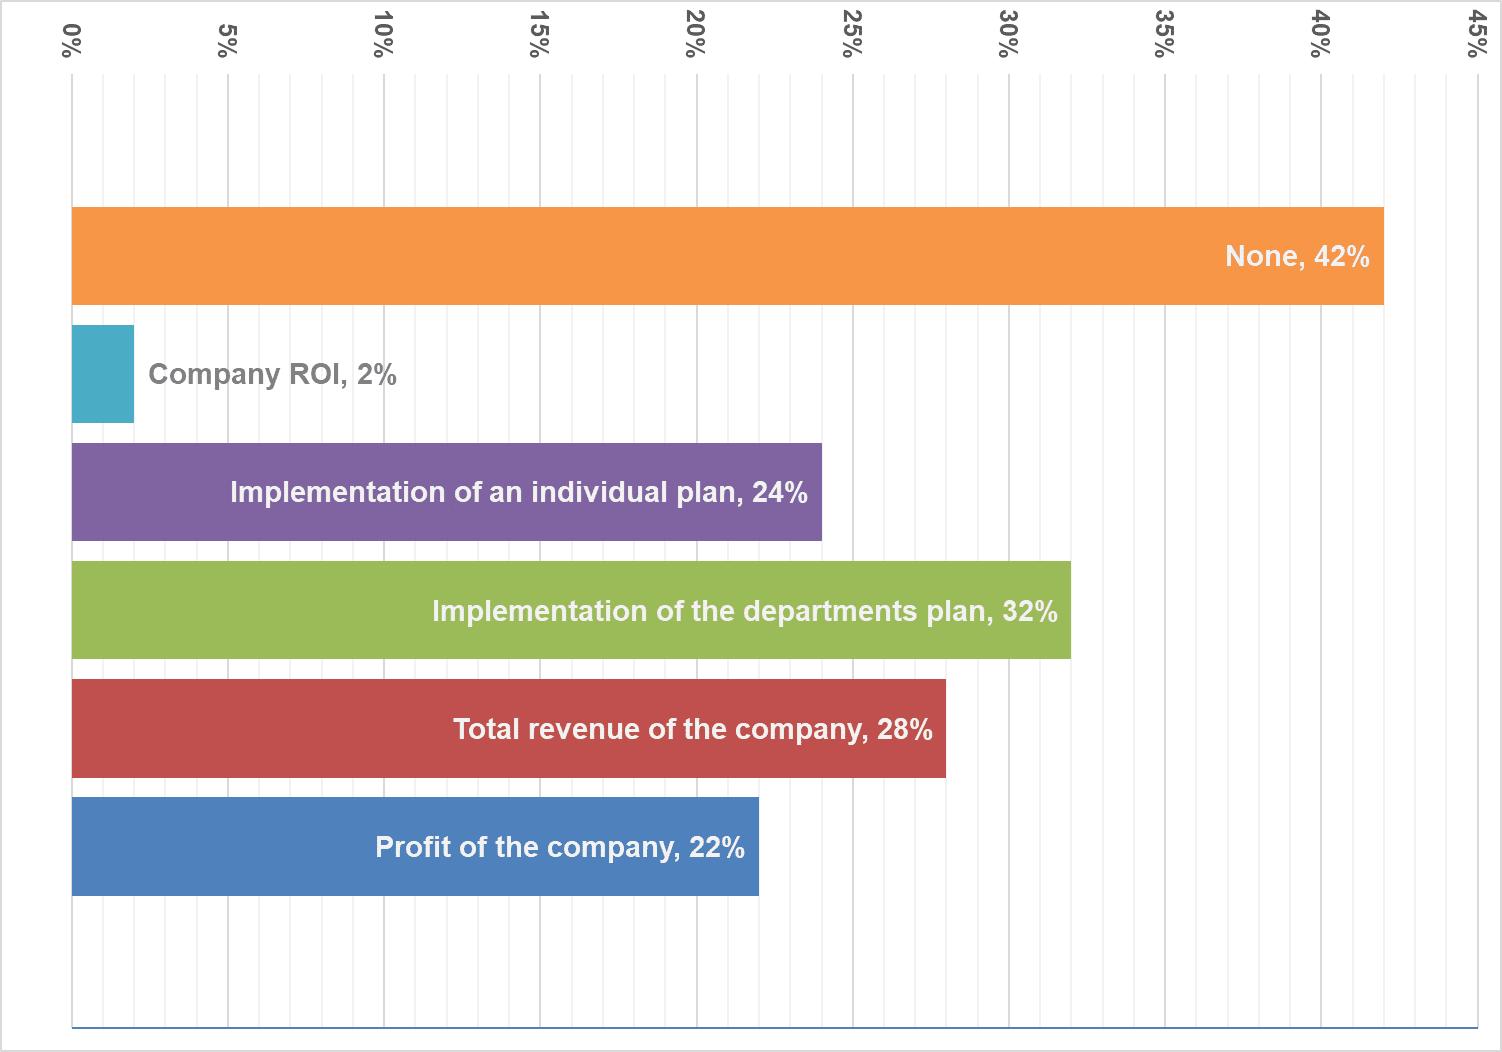 Fig. 18. KPIs tied to a bonus